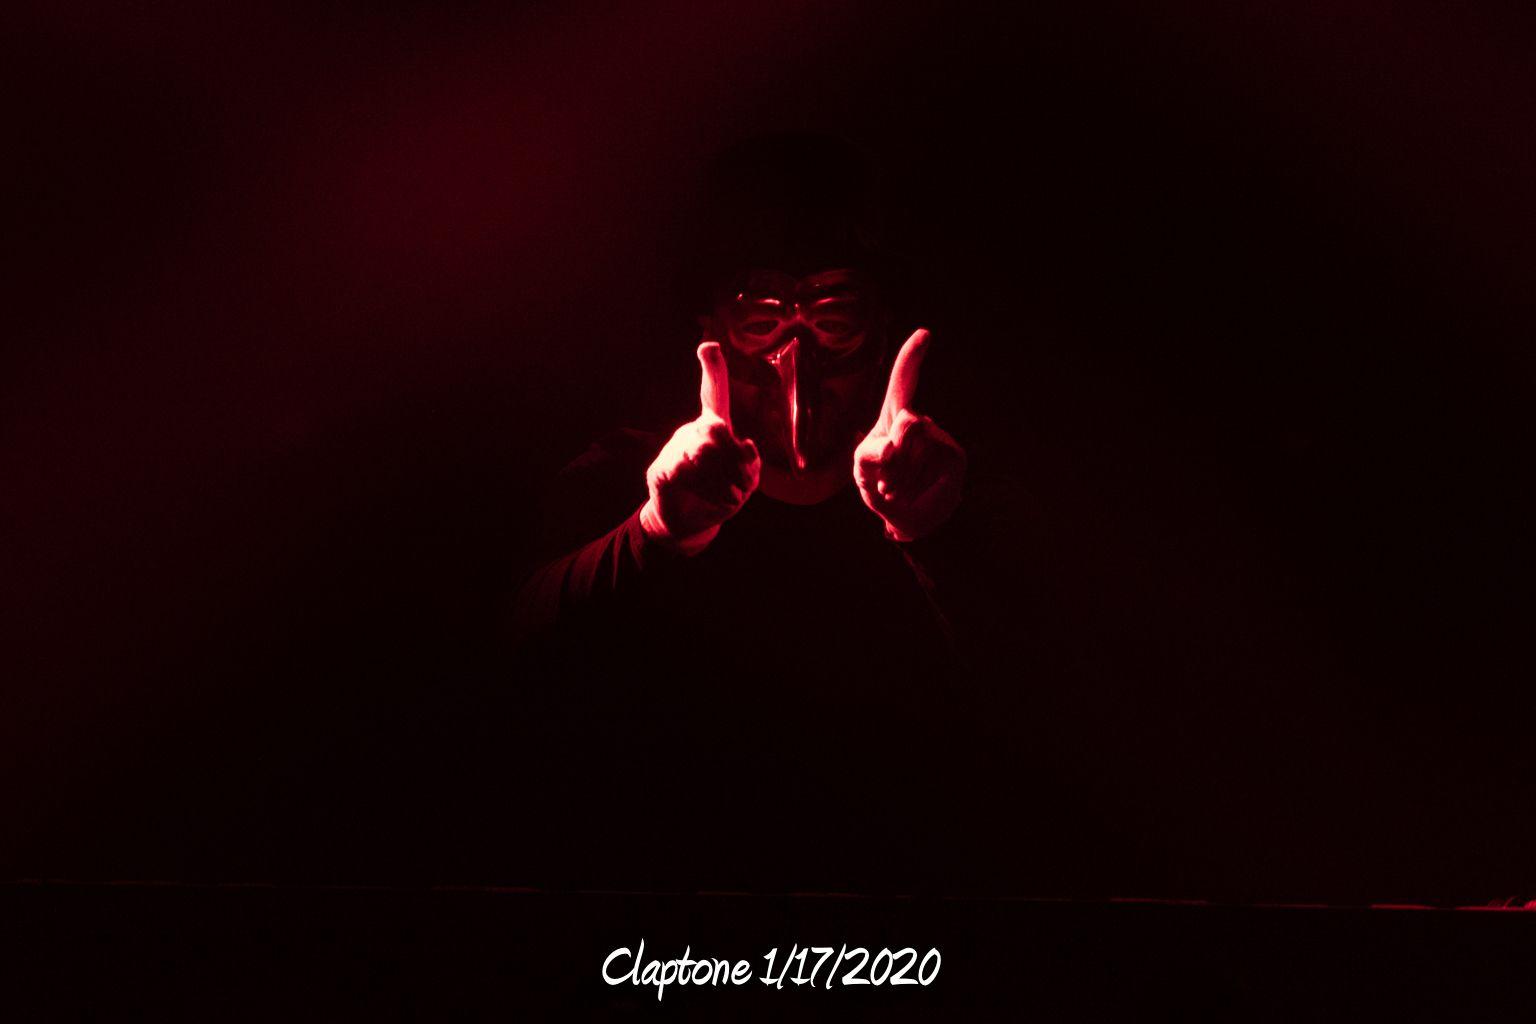 Claptone 1/17/20